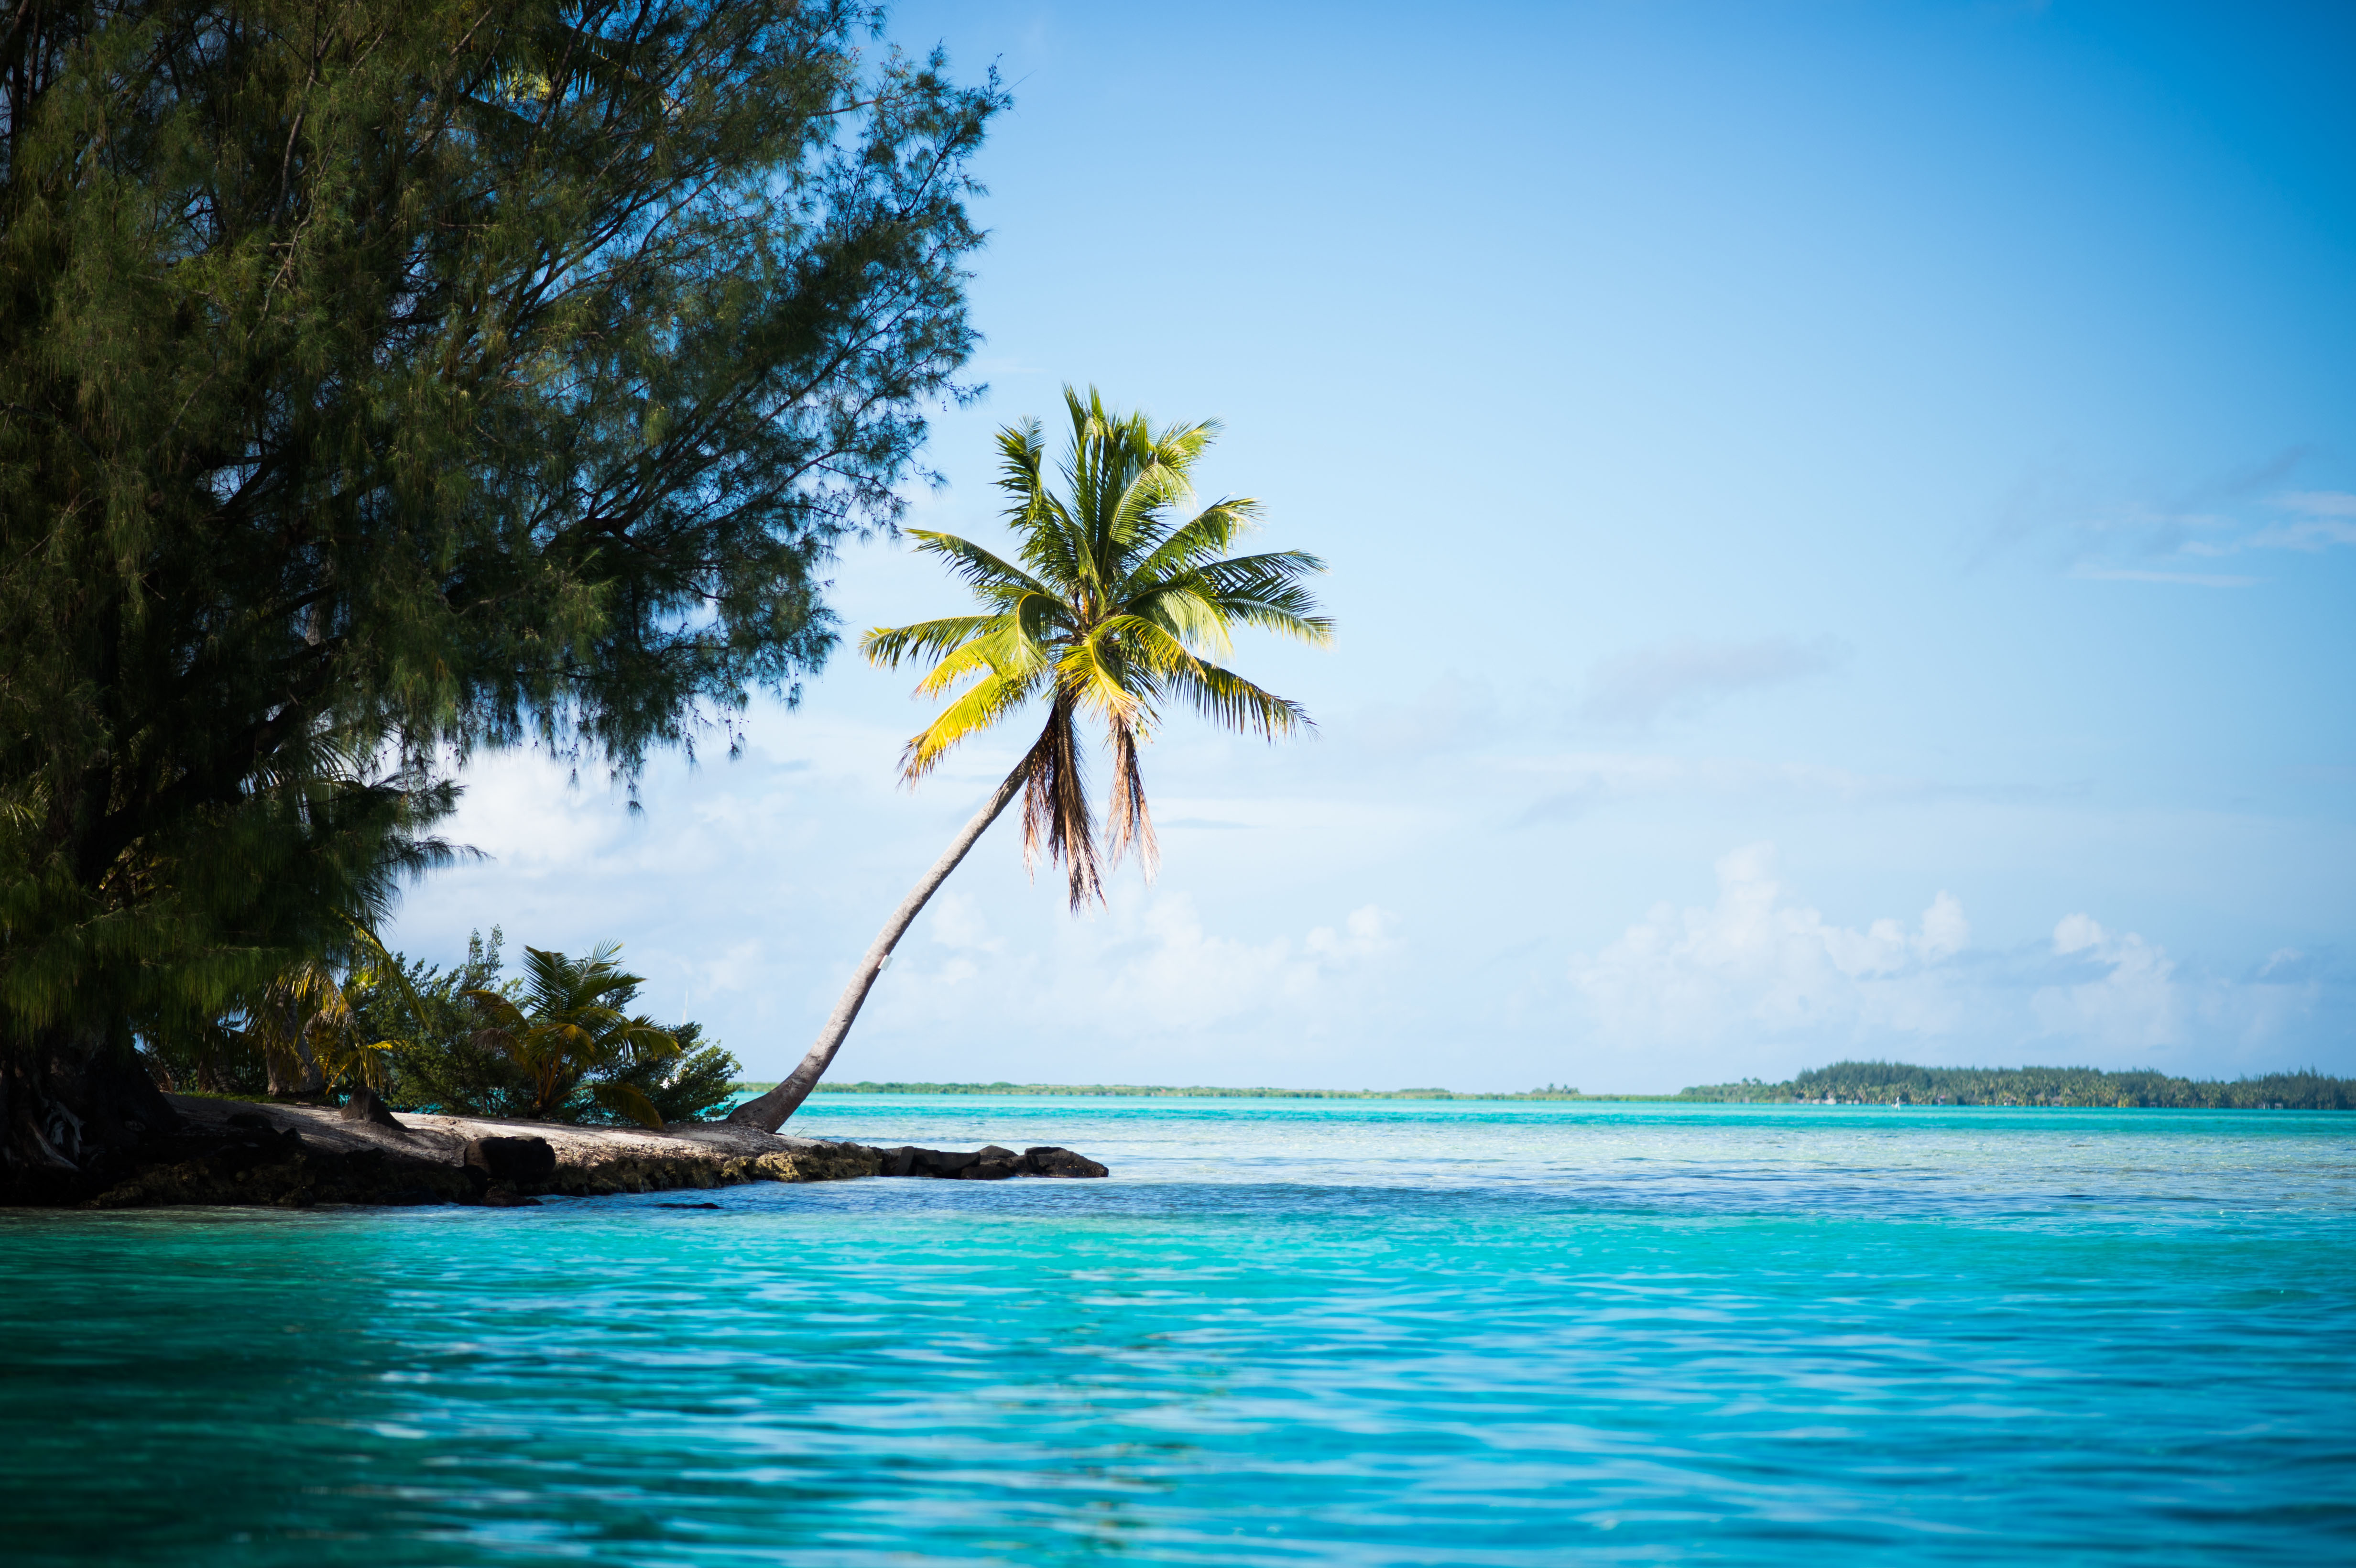 Dive Deep Into Bora Bora With This Stunning Photo Spread